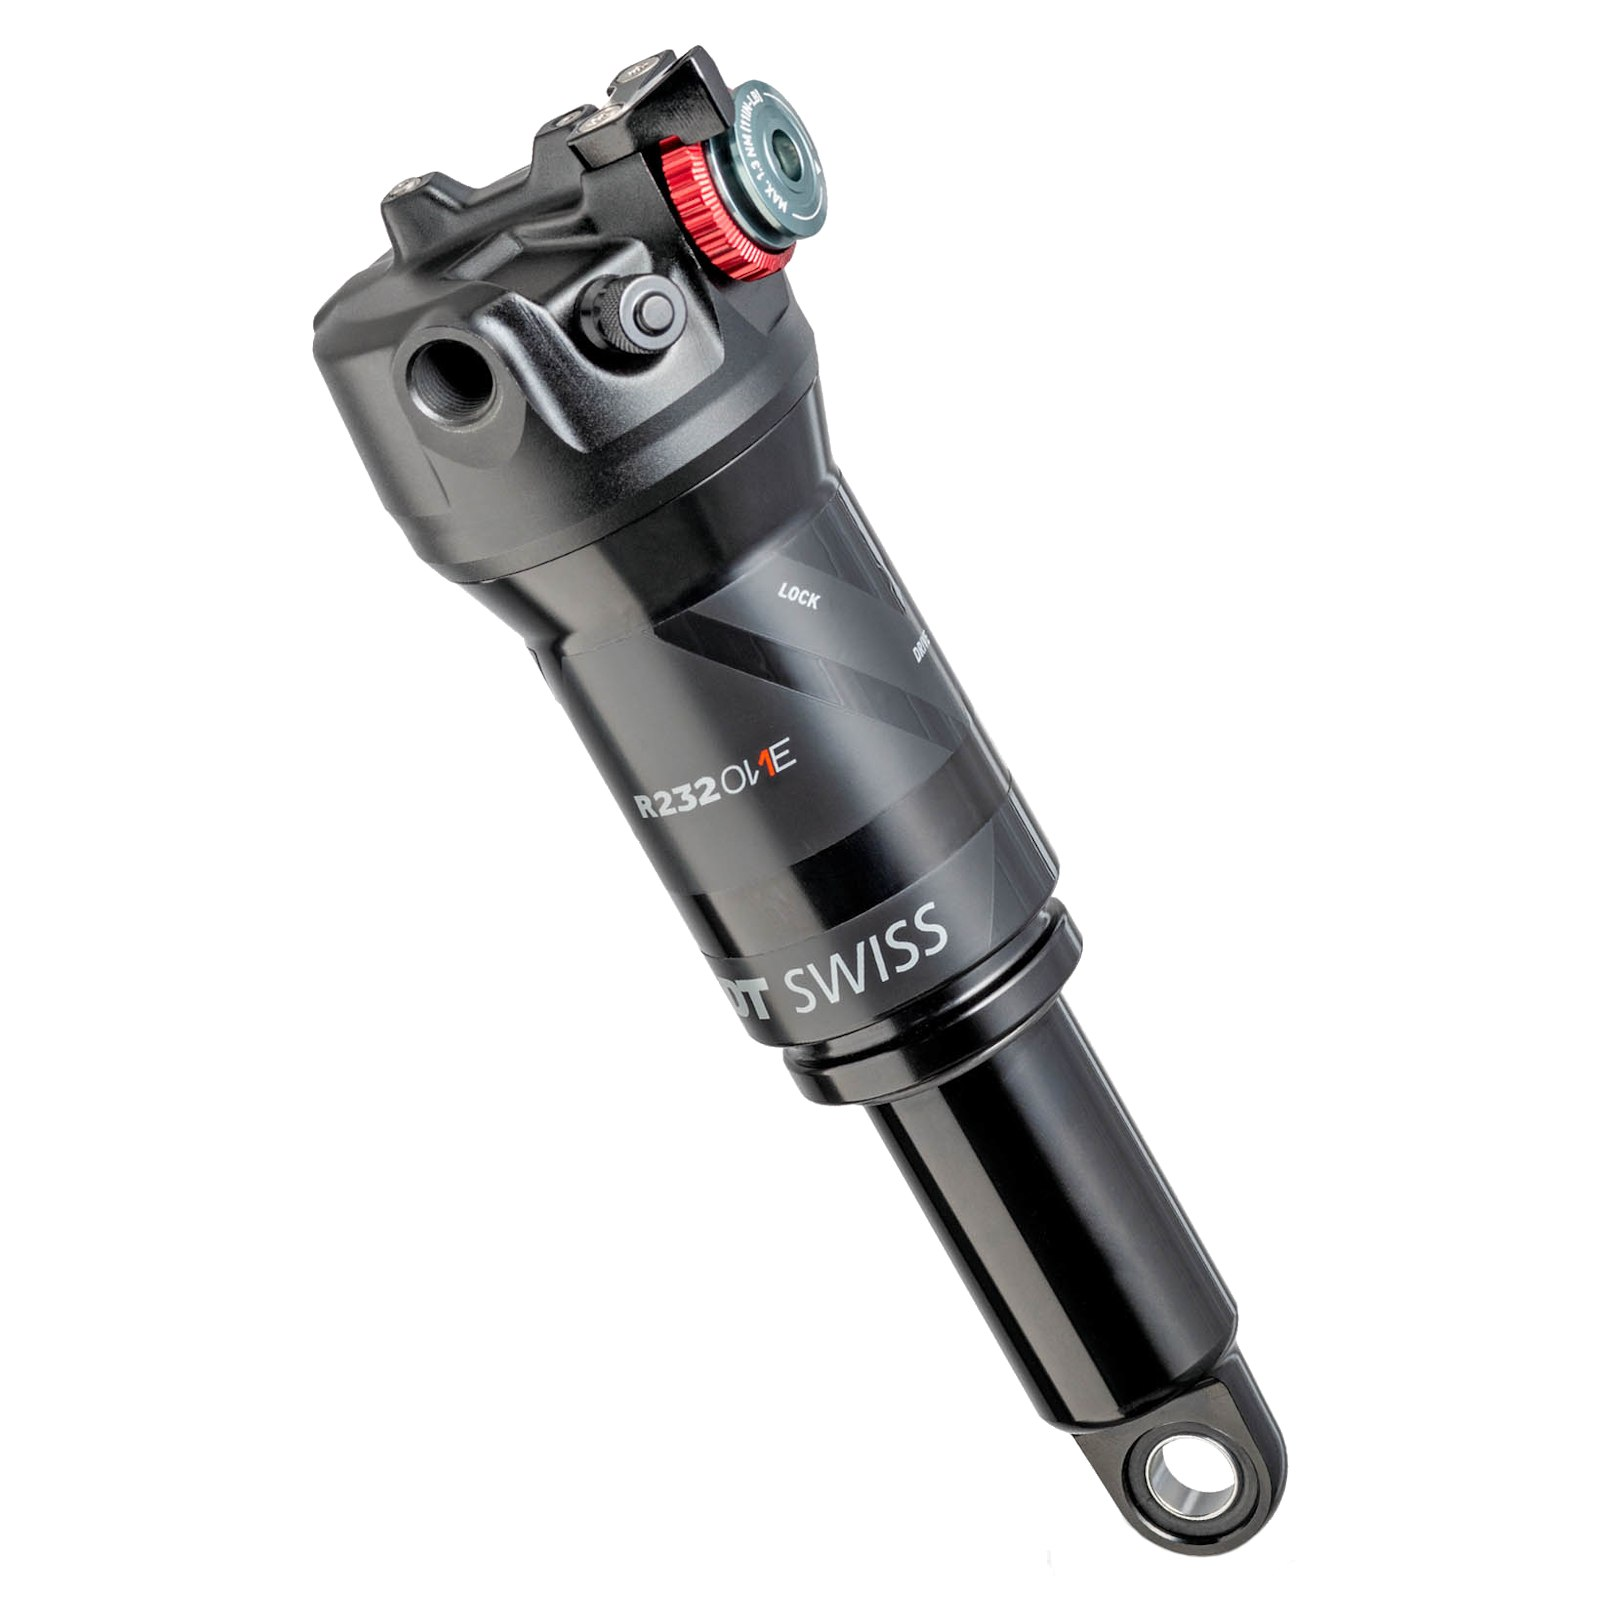 DT Swiss R 232 ONE Rear Shock - Remote 2-in-1 - Trunnion